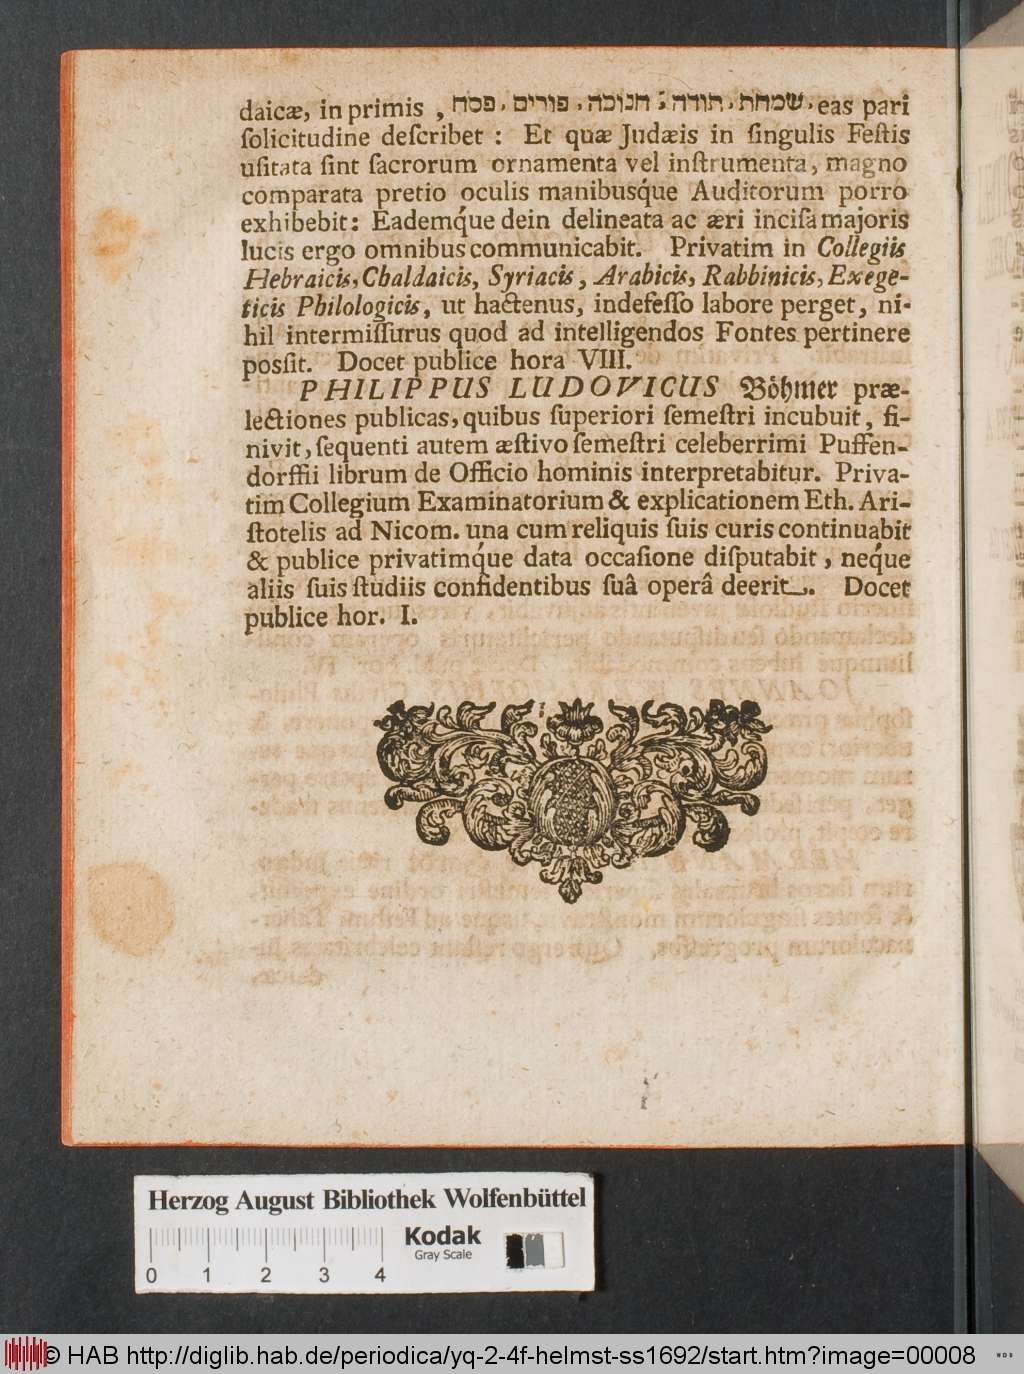 http://diglib.hab.de/periodica/yq-2-4f-helmst-ss1692/00008.jpg